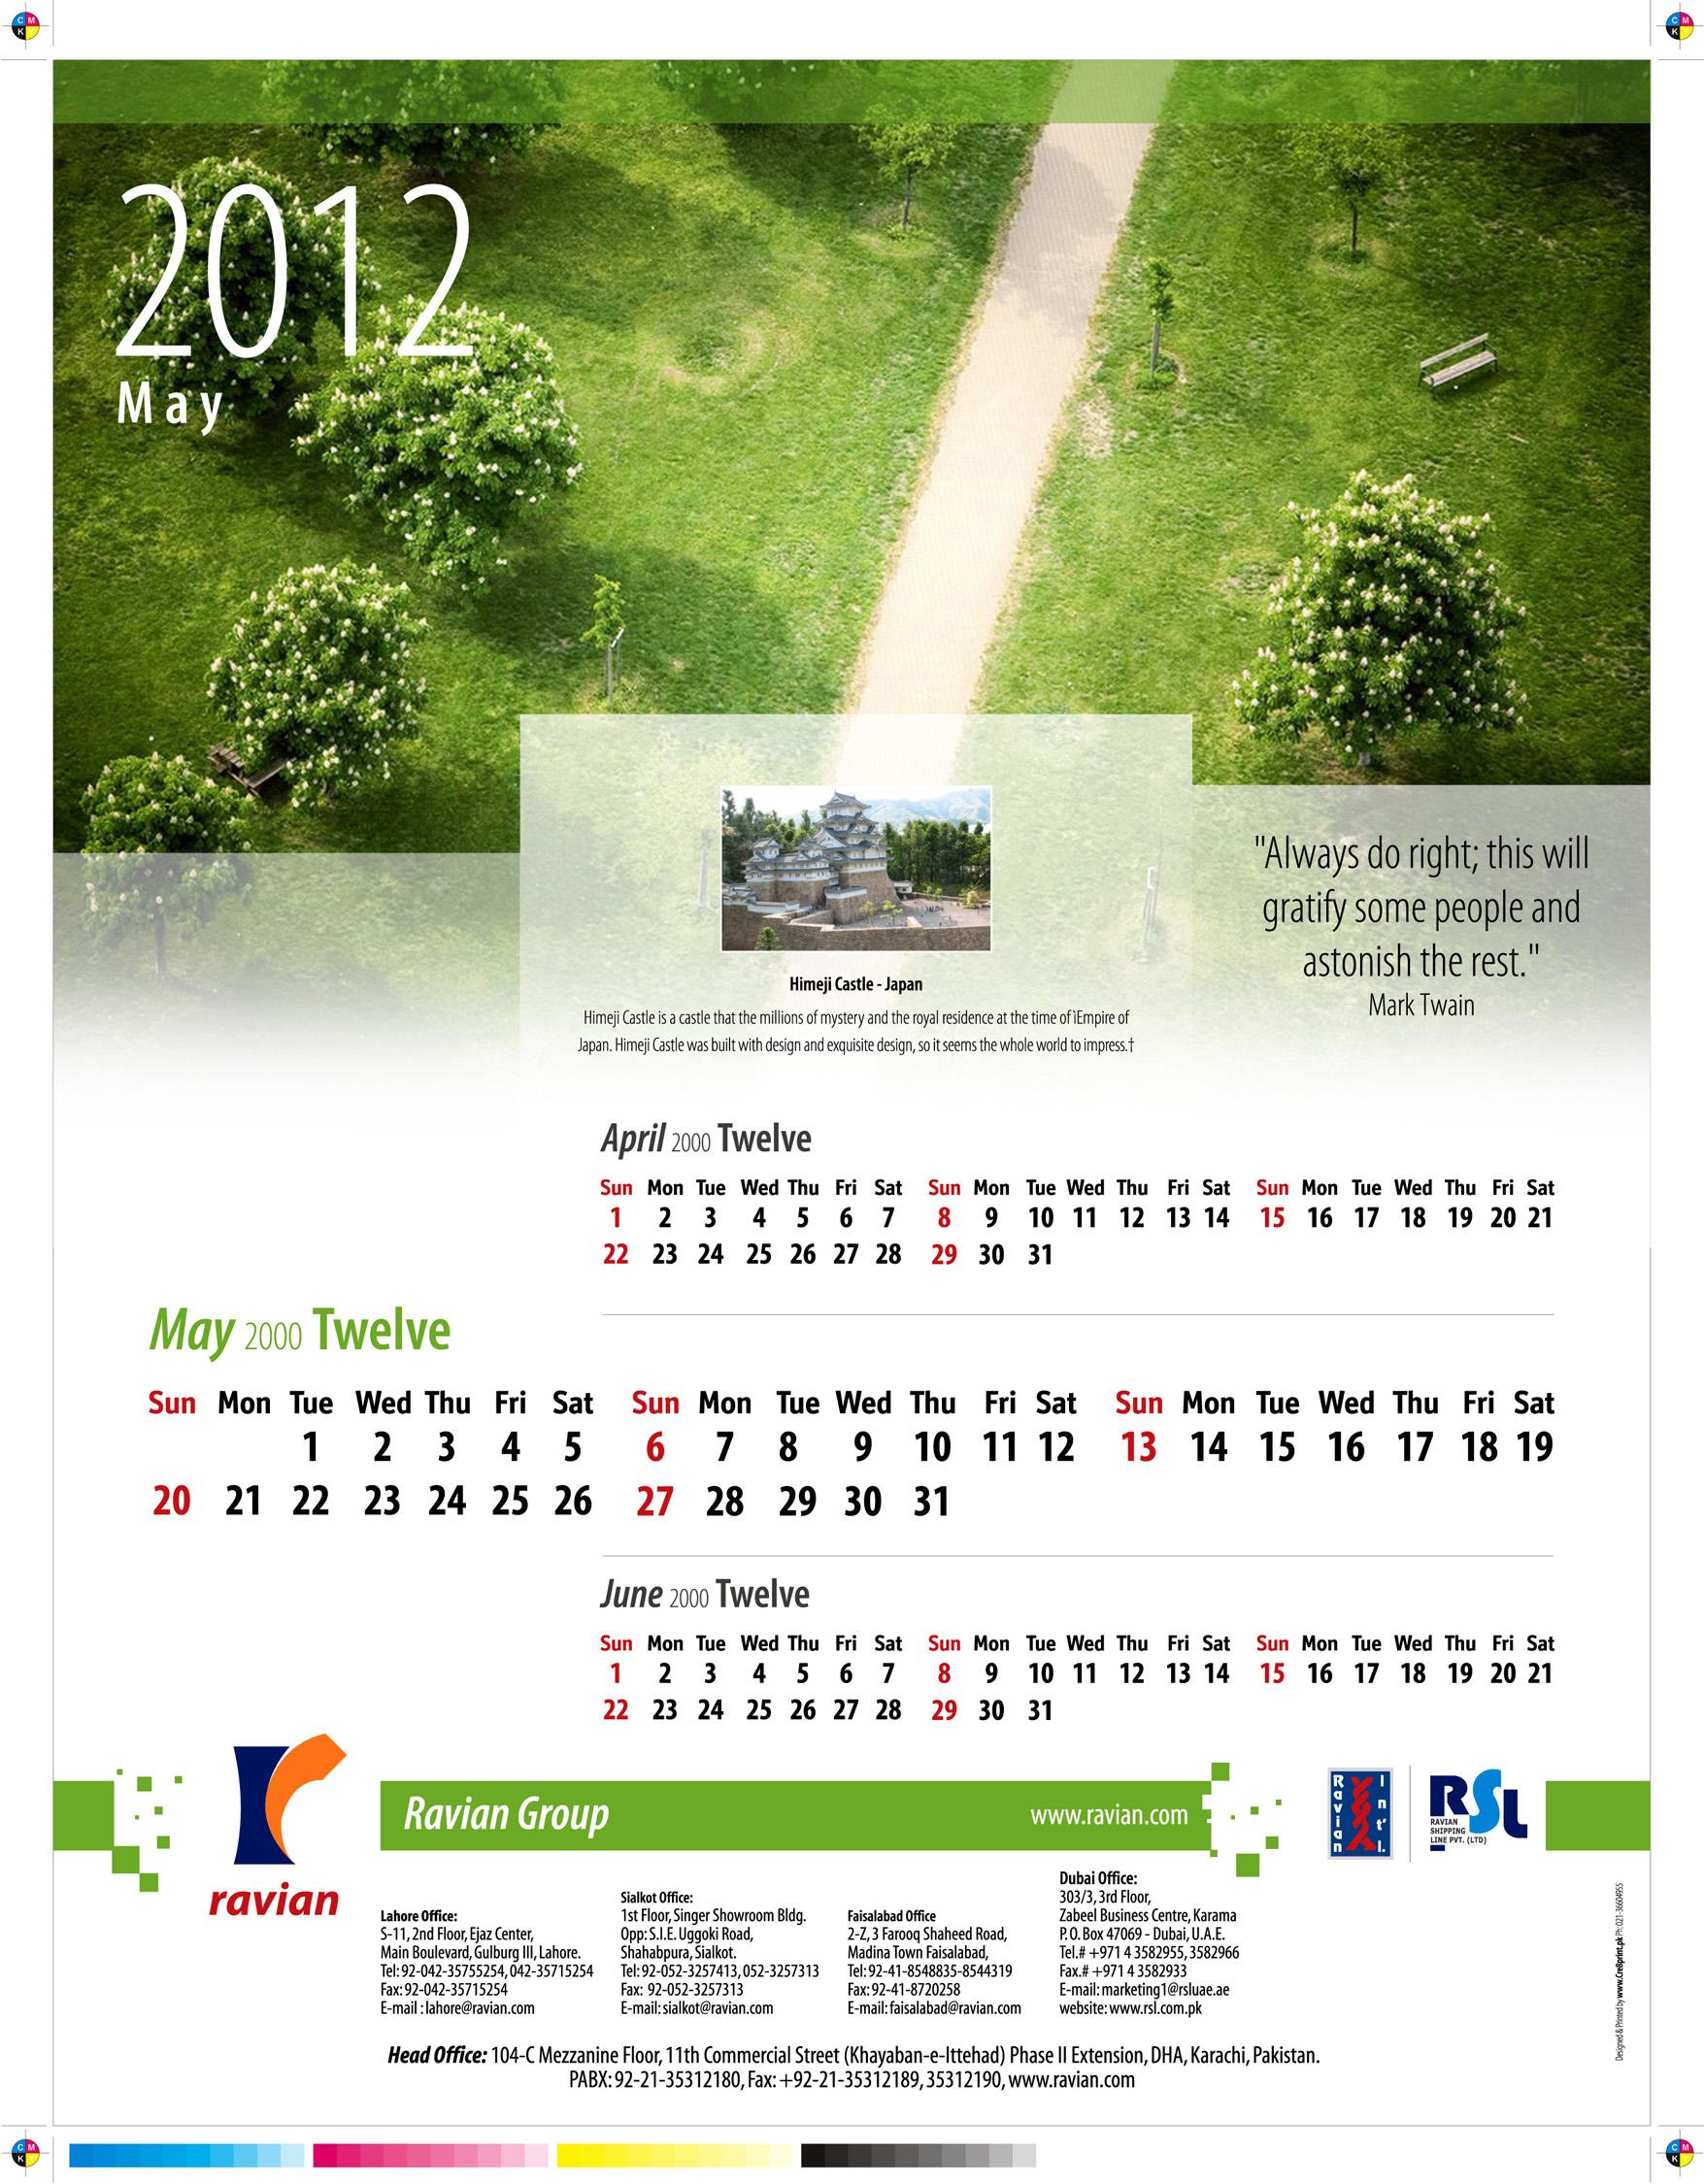 Corporate Calendar Design : Calendar designs by kamran akhlaq at coroflot